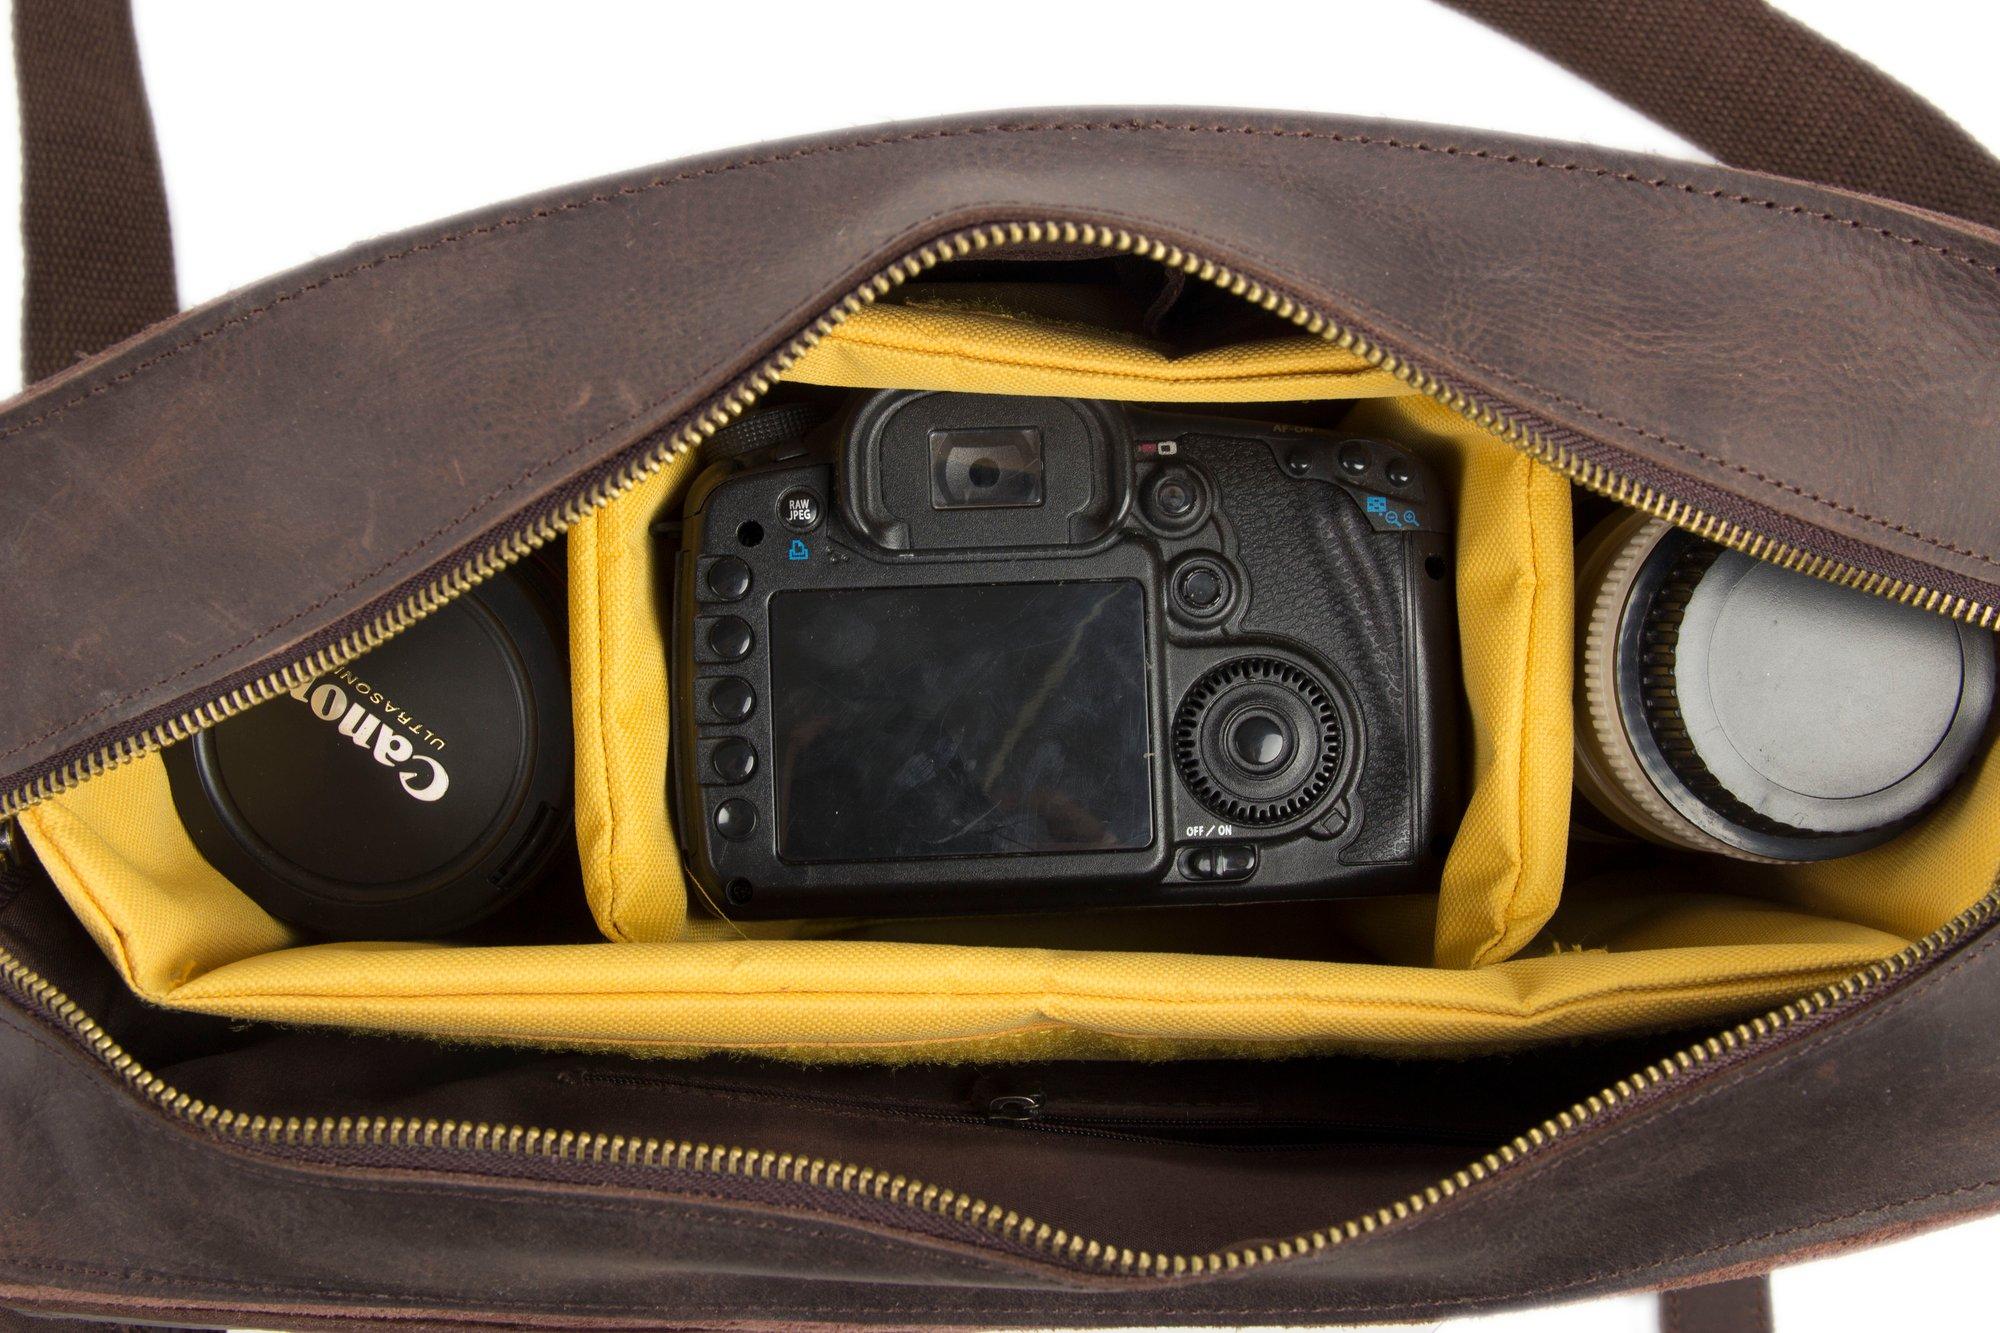 Image Of Genuine Leather Dslr Camera Bag Briefcase 7200